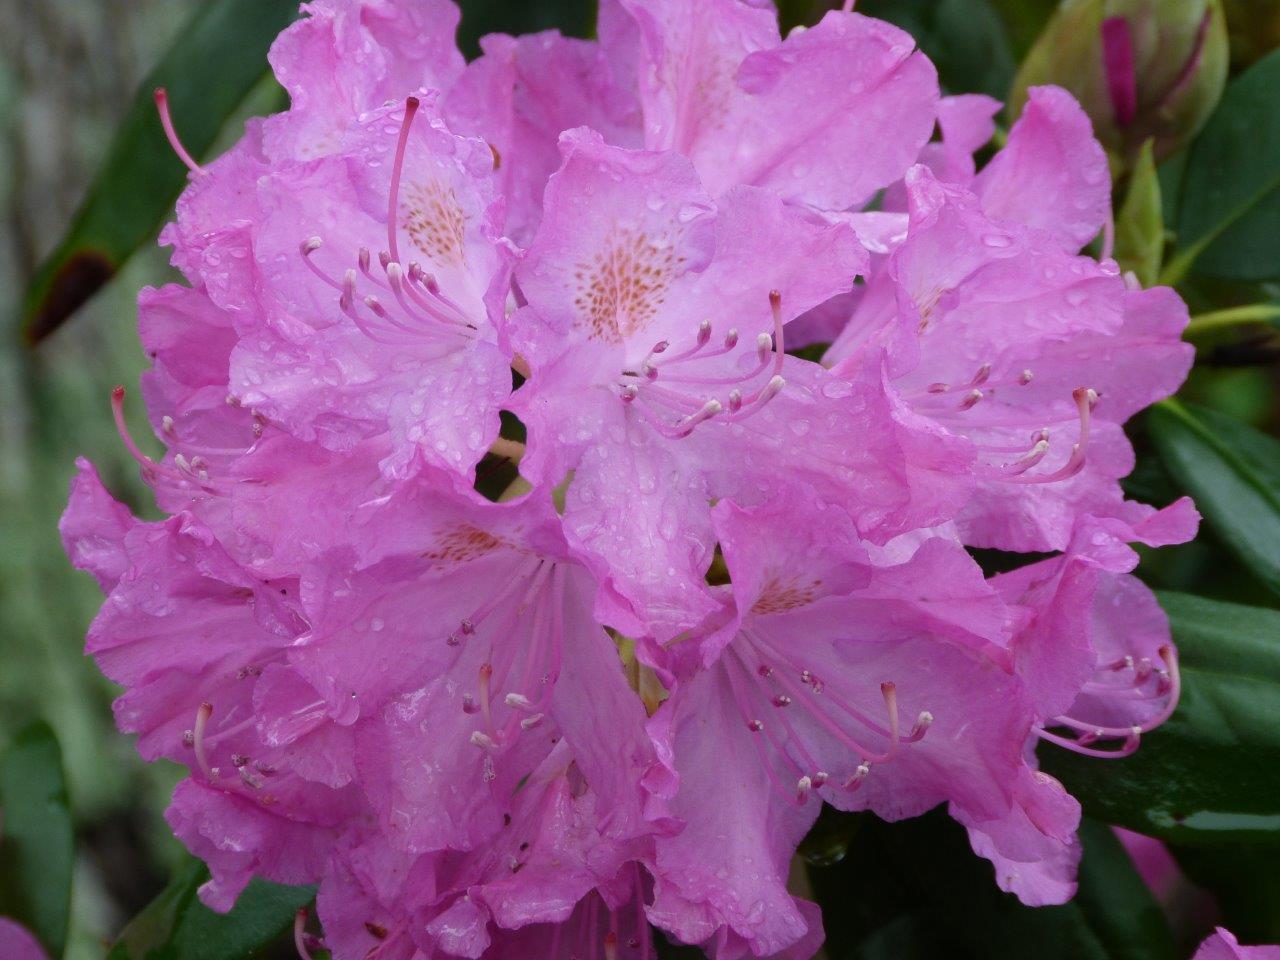 2016 April - Spring flowers, Rainy morning, Irises, Garden, Blog 012